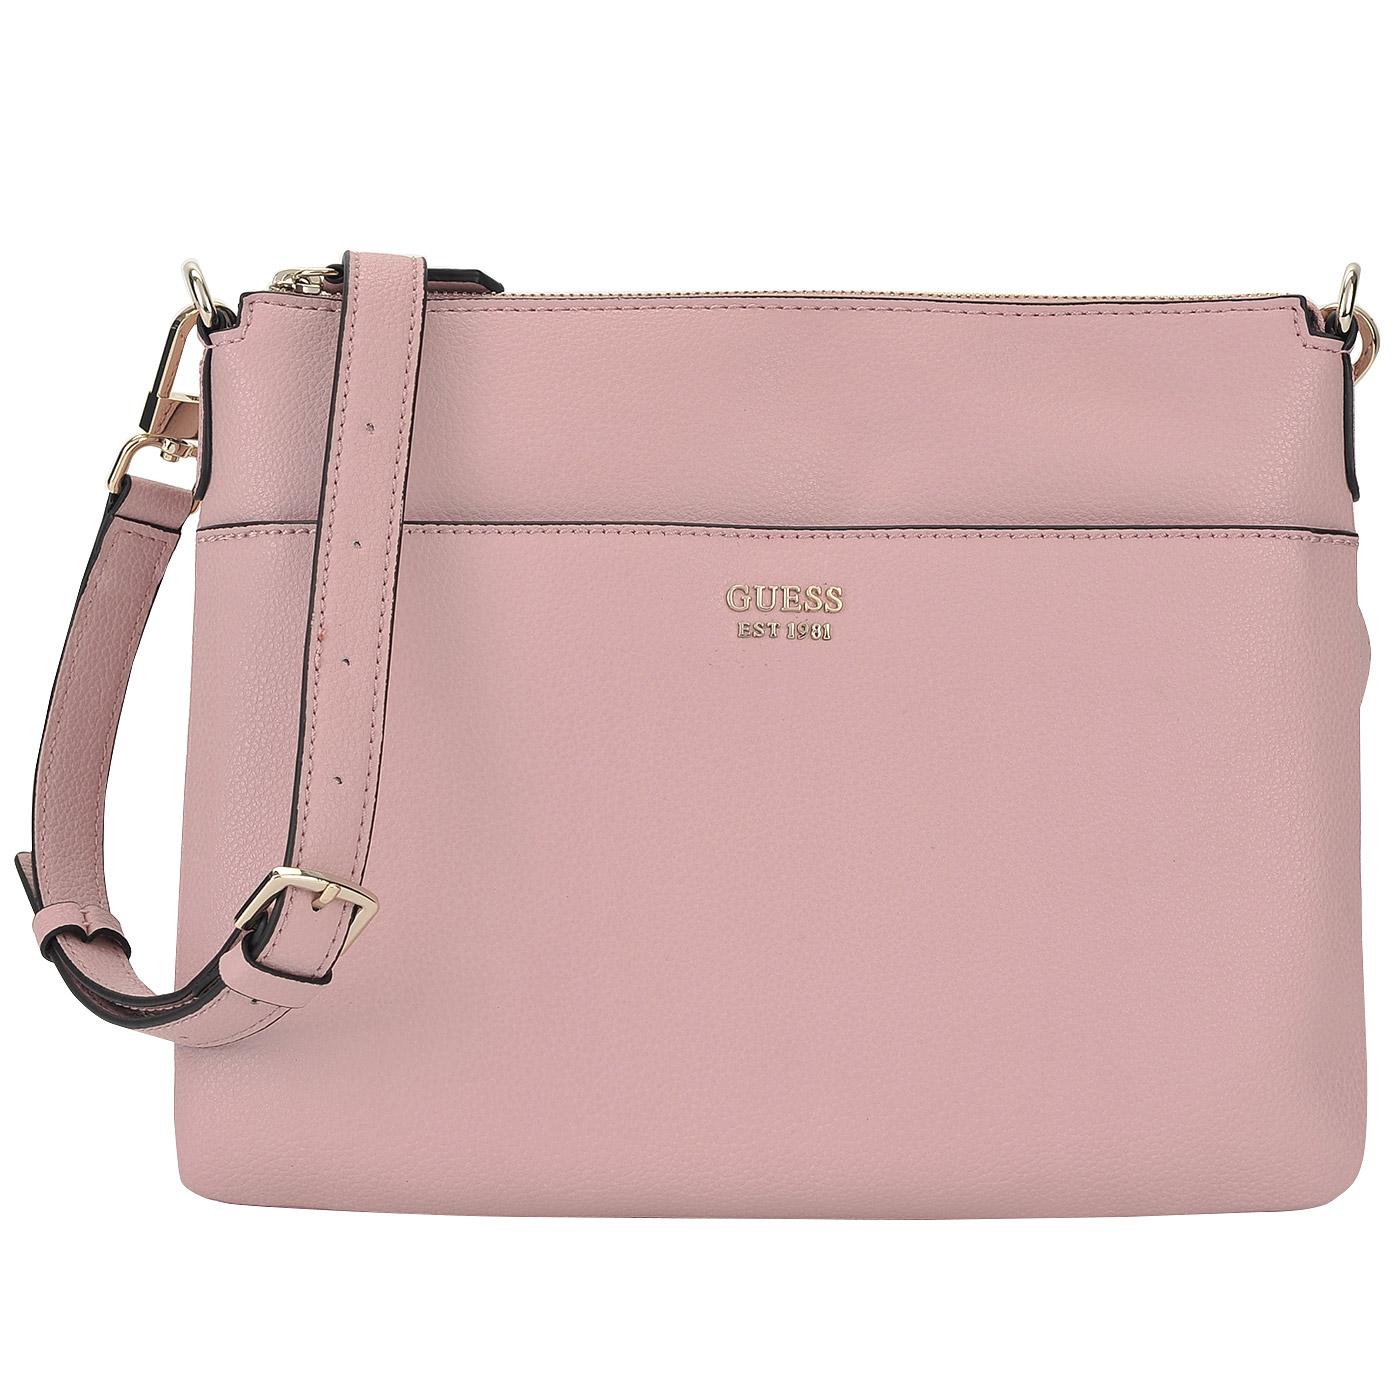 f07459457030 Женская сумка на молнии с плечевым ремешком Guess Digital HWVG68 ...